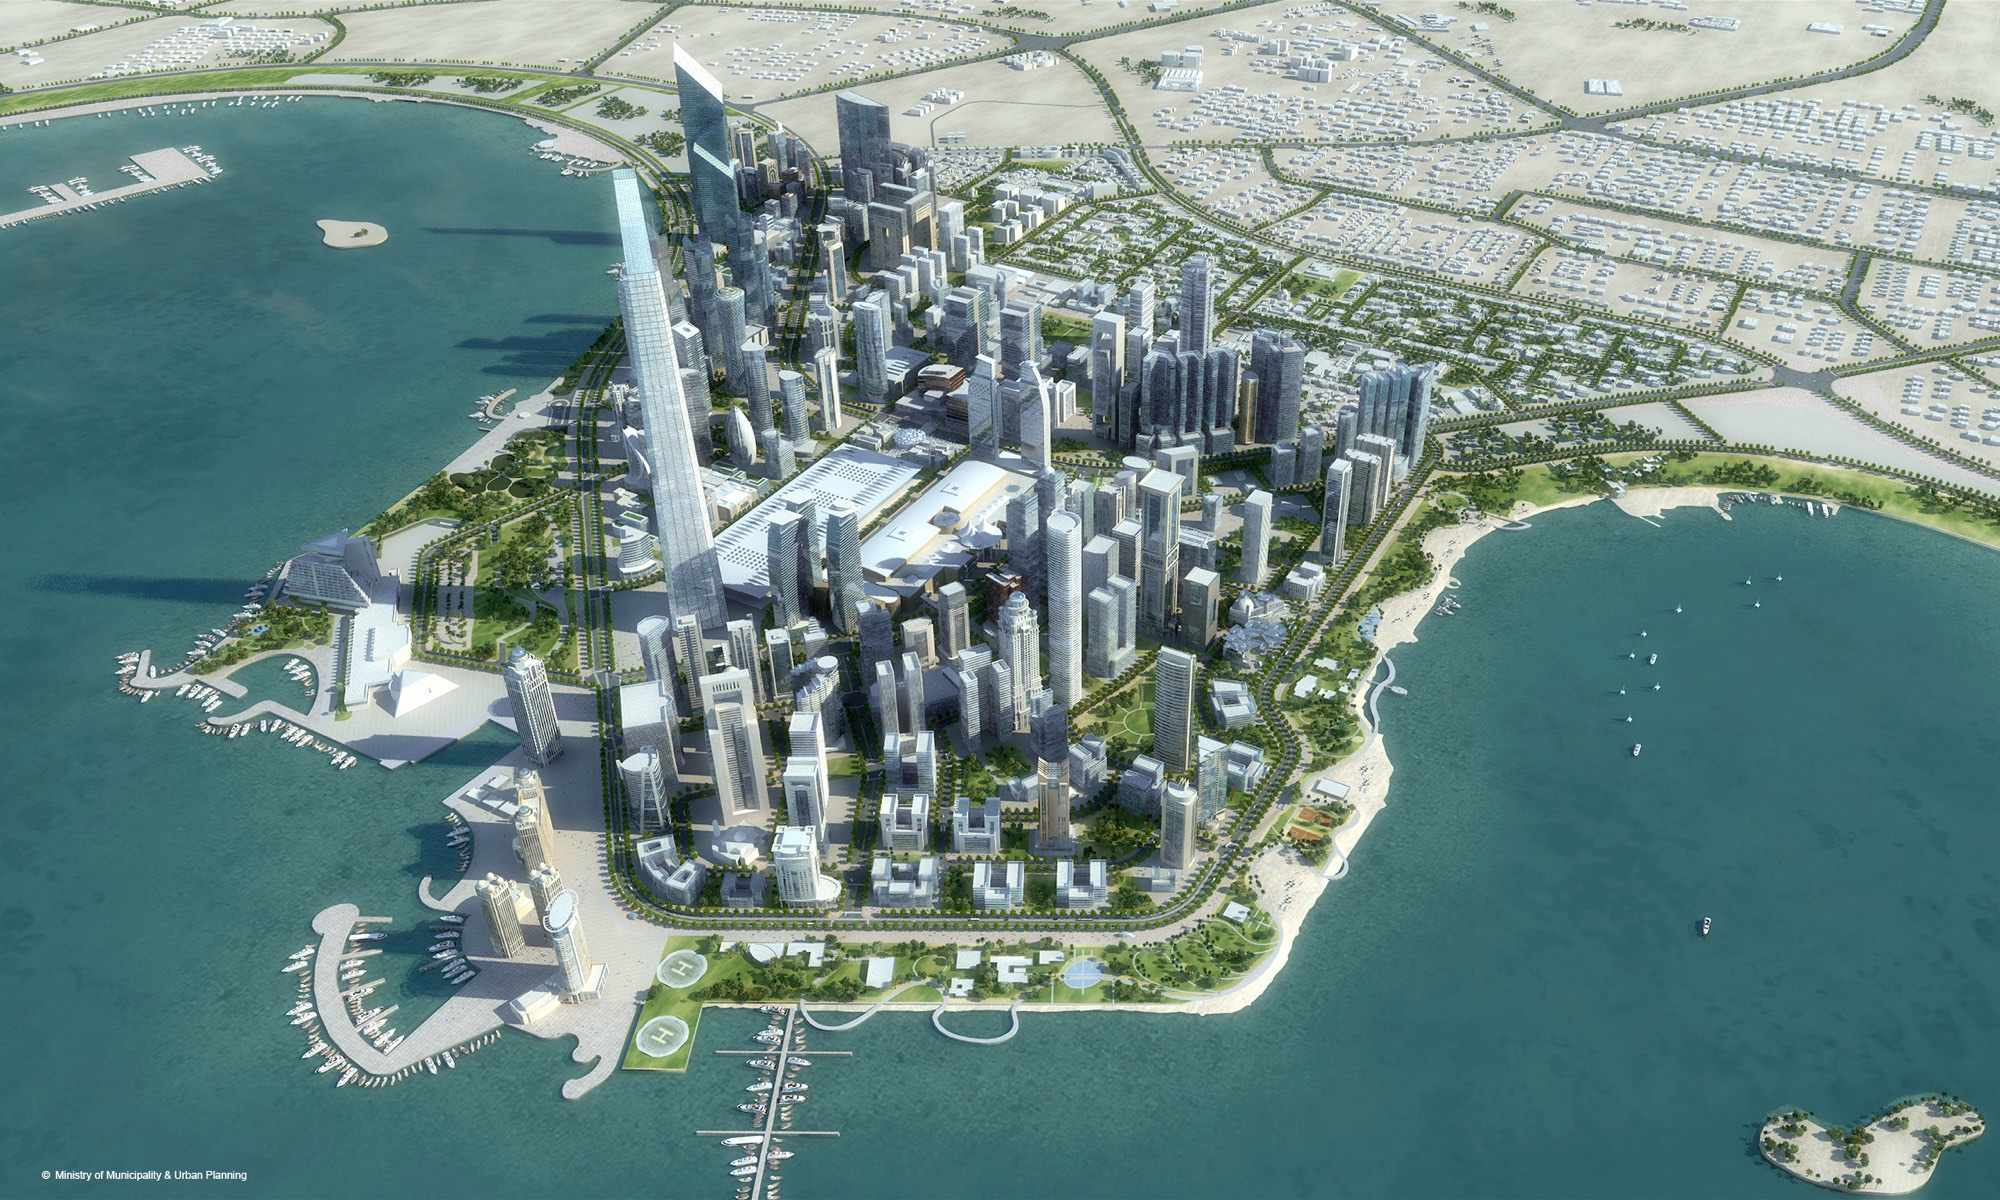 Qatar National Development Framework